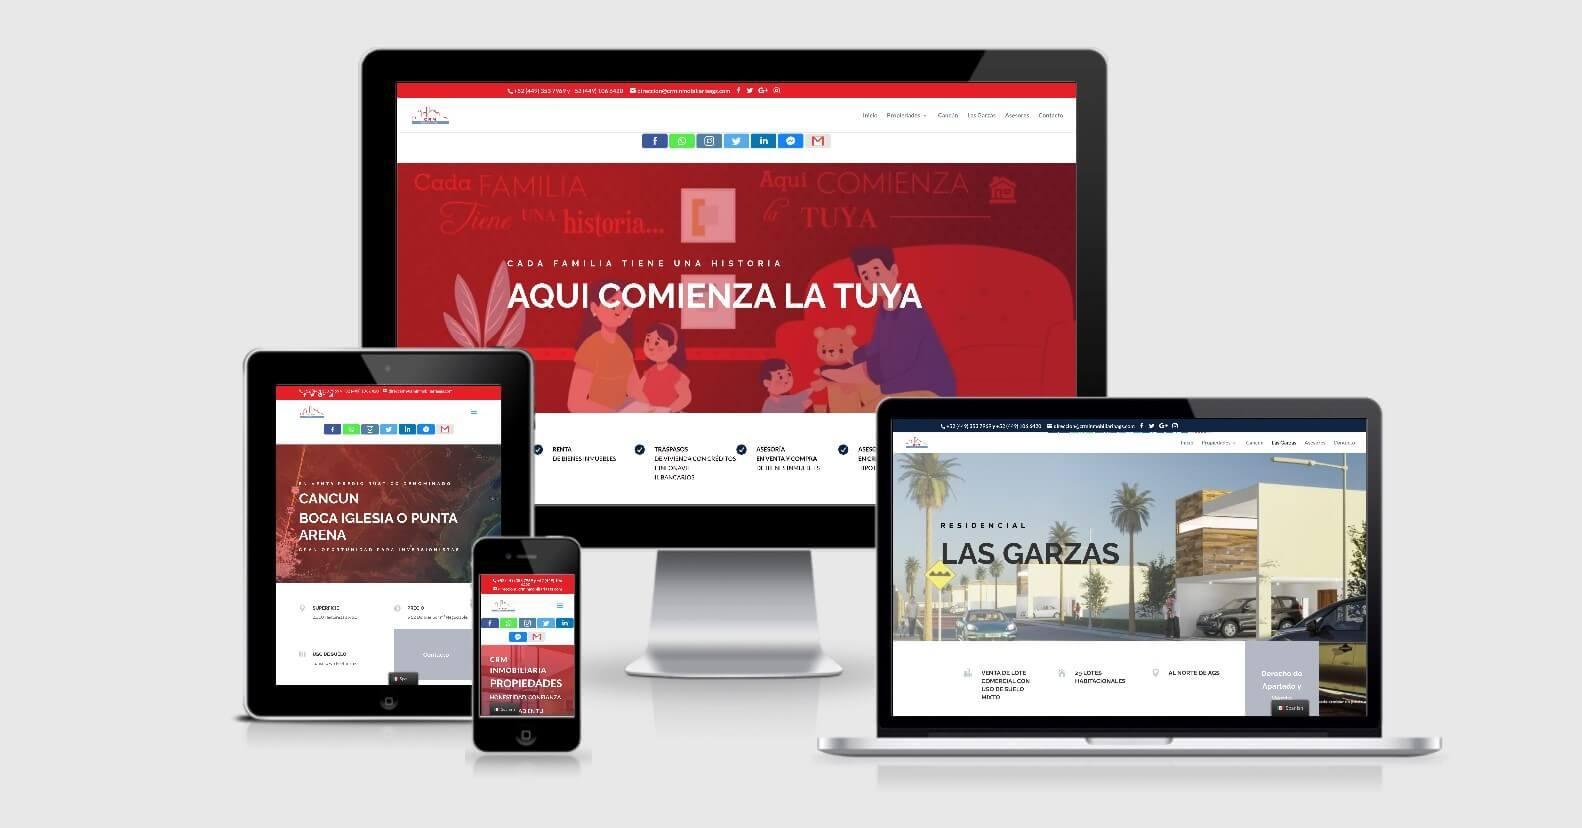 crminmobiliariaags.com_website